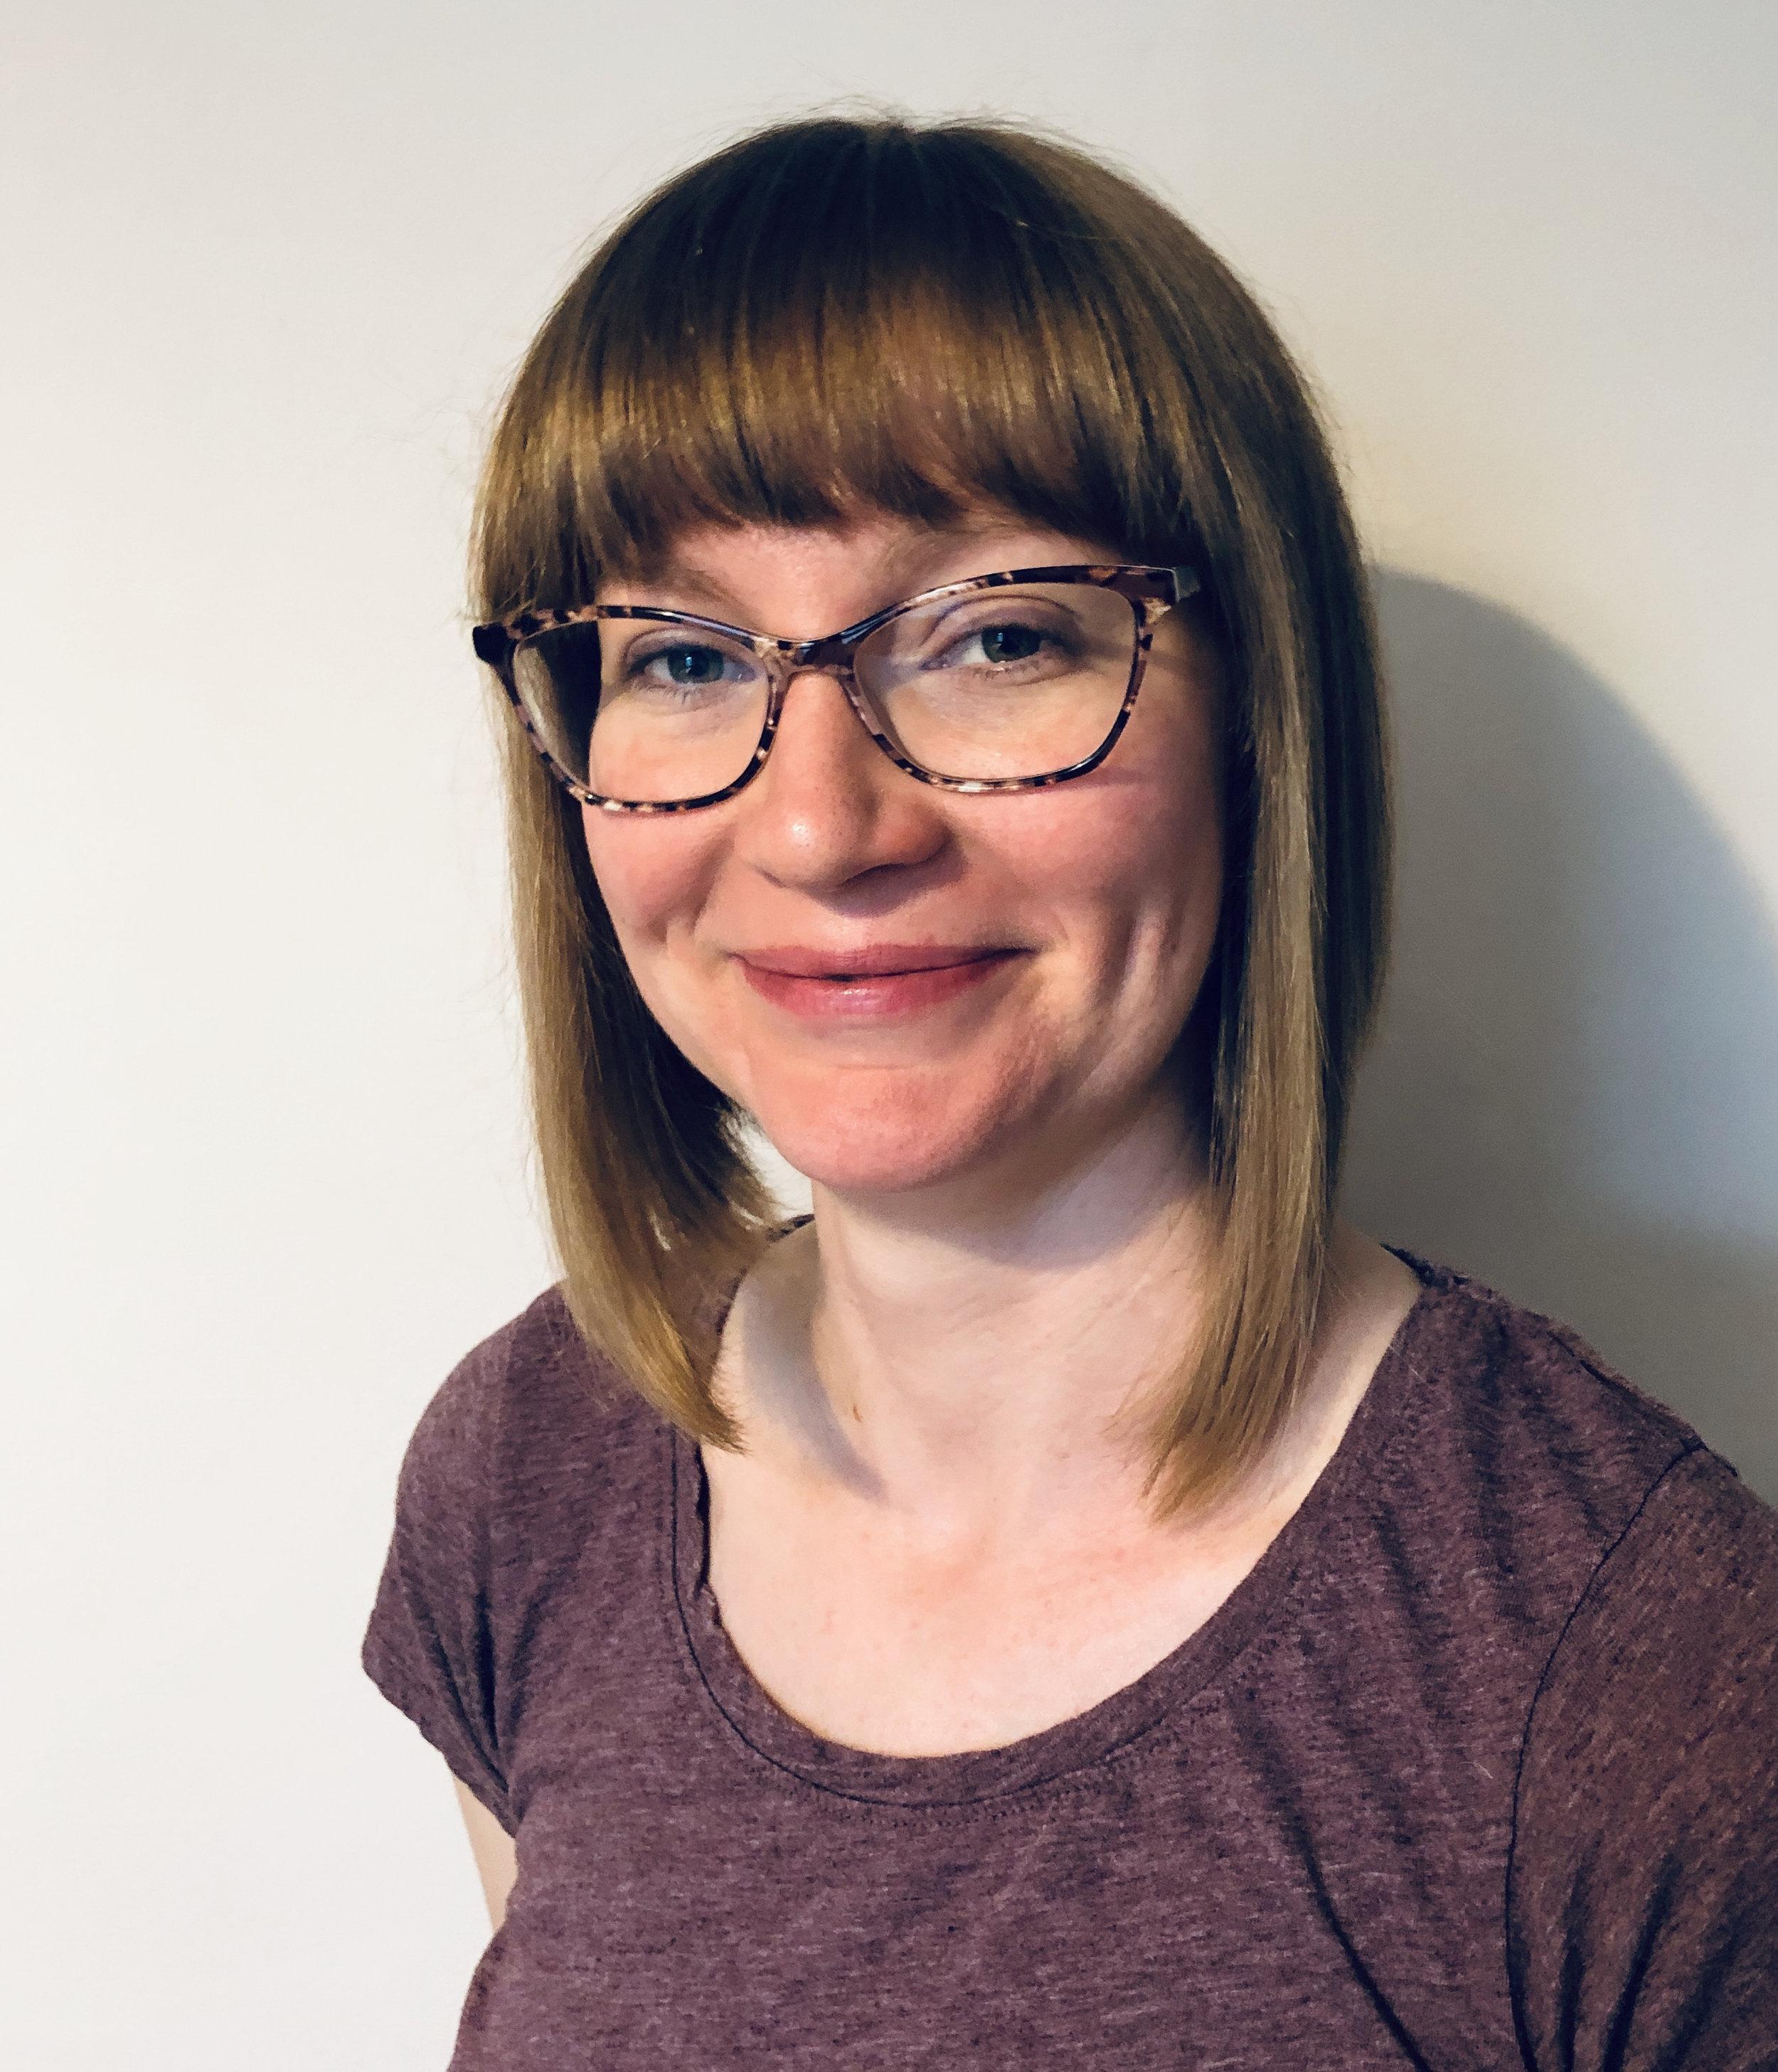 Samantha McCormick -